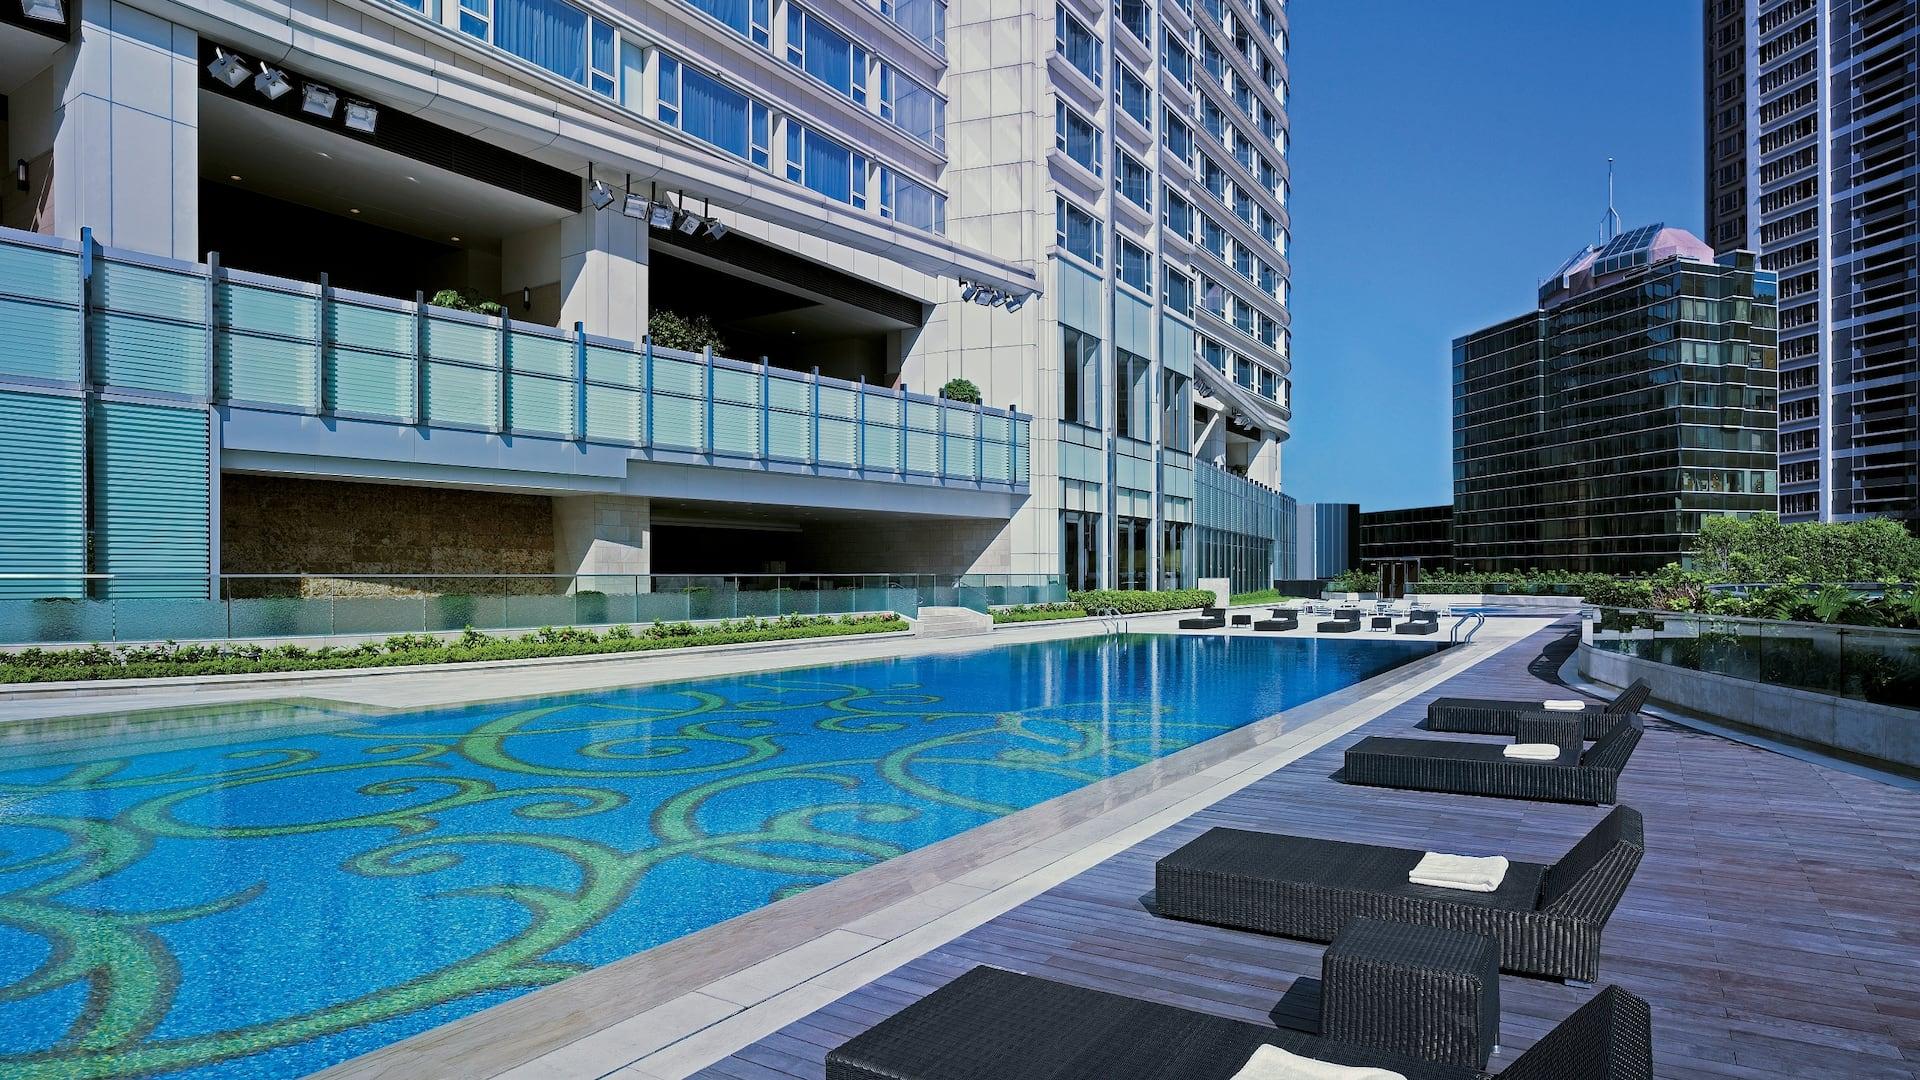 Hyatt Regency Tsim Sha Tsui Outdoor Heated Swimming Pool